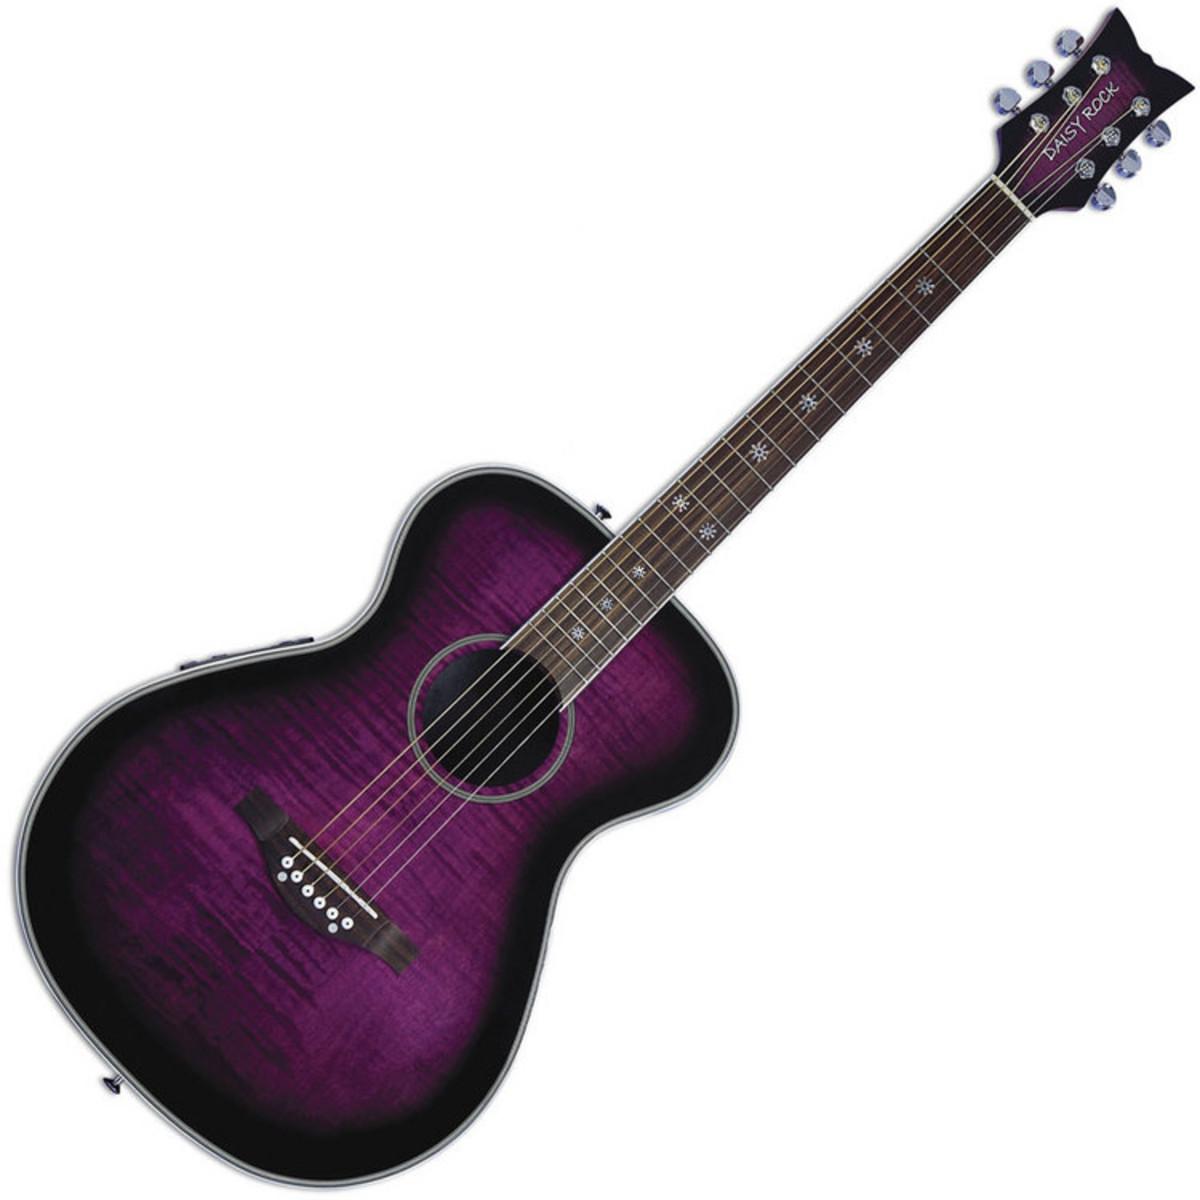 Electric Guitar Input Jack Diagram Free Download Wiring Diagrams